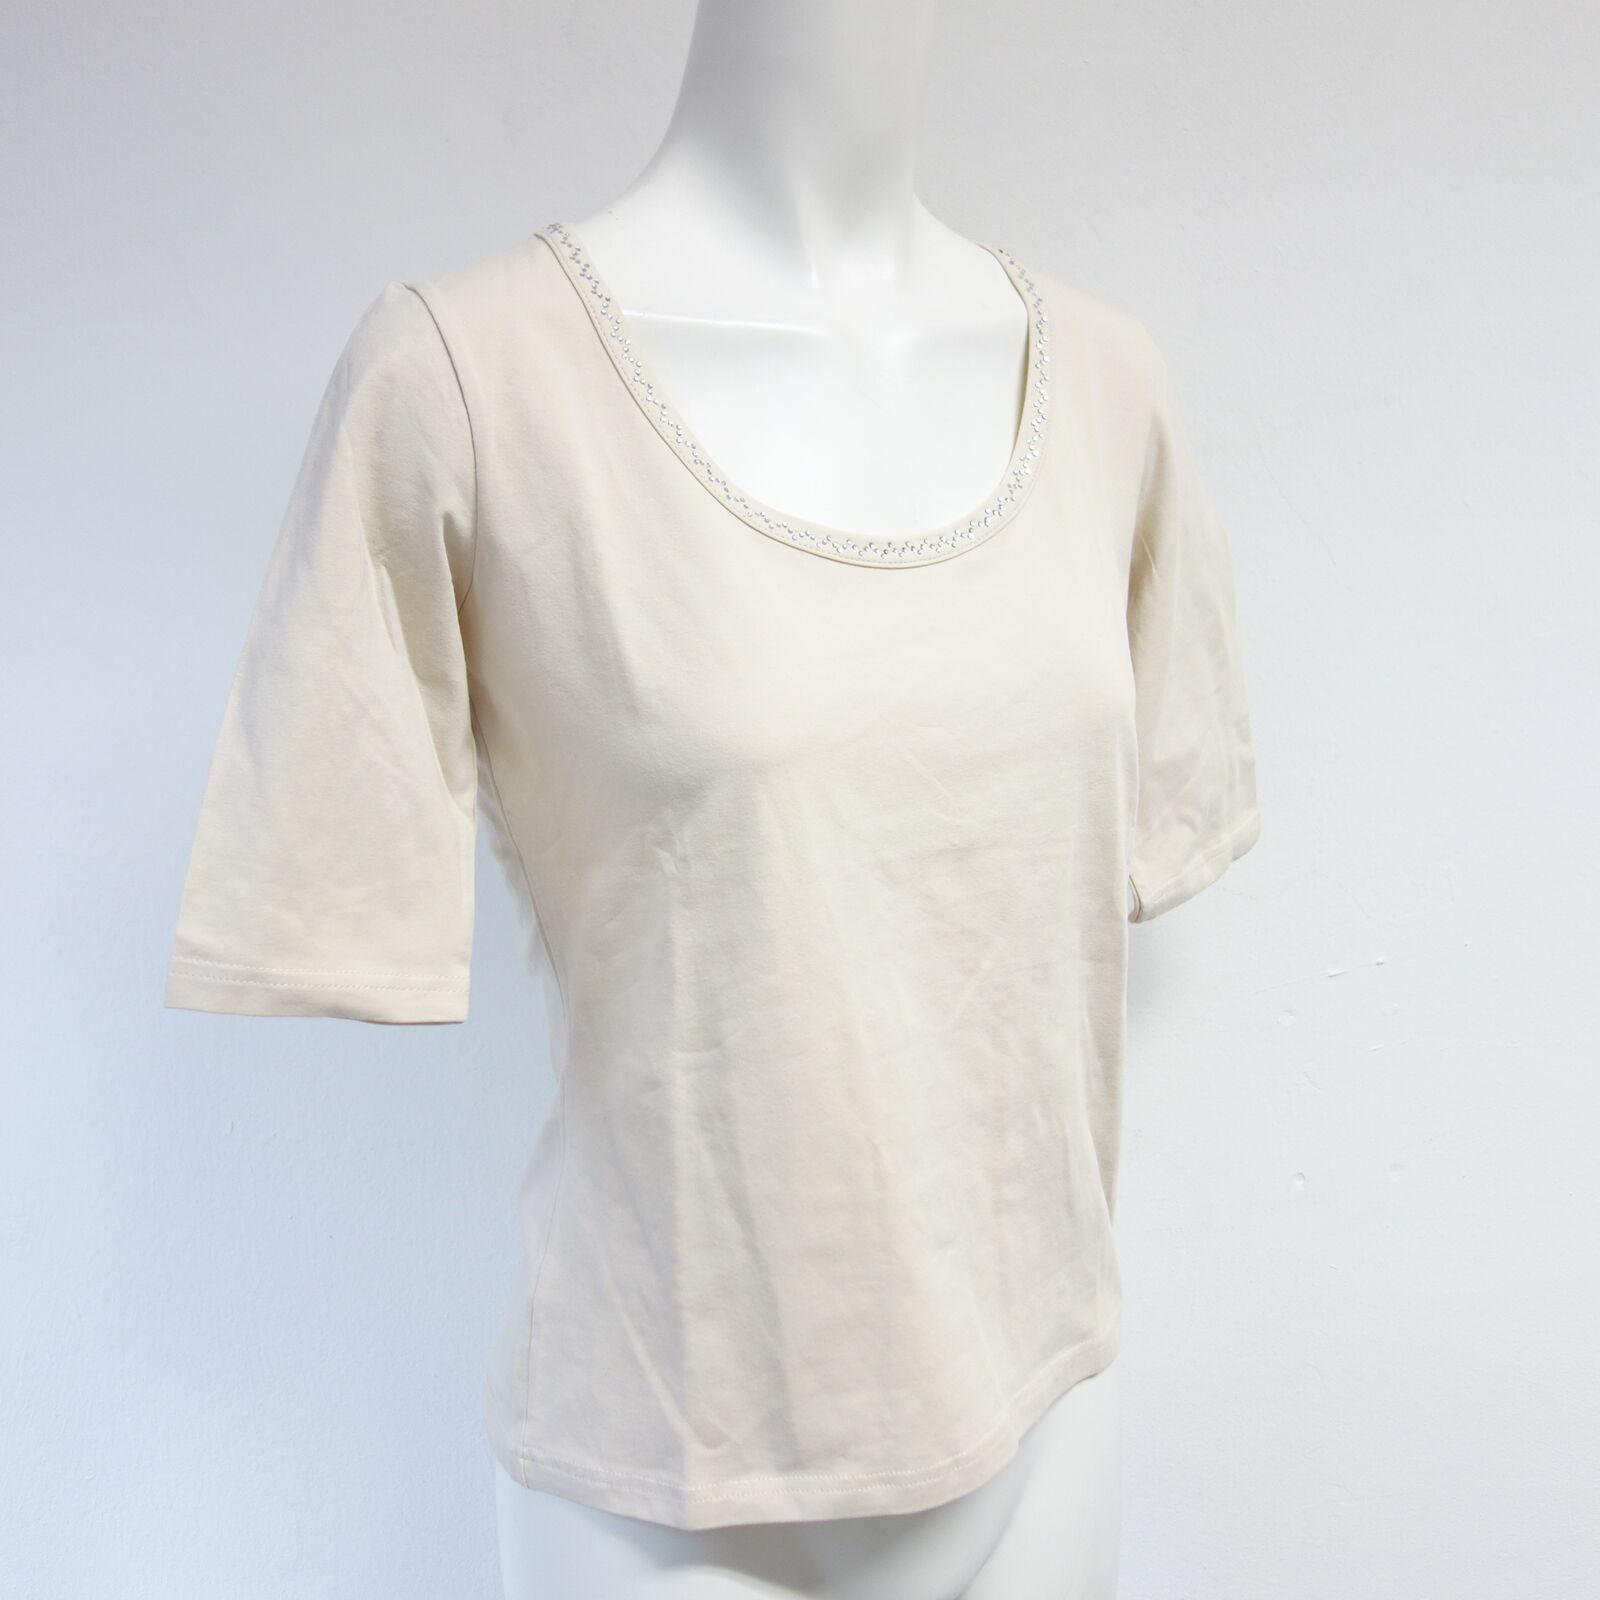 S marron catégorie B SEM per lei 536808 T-Shirt Femmes Top T